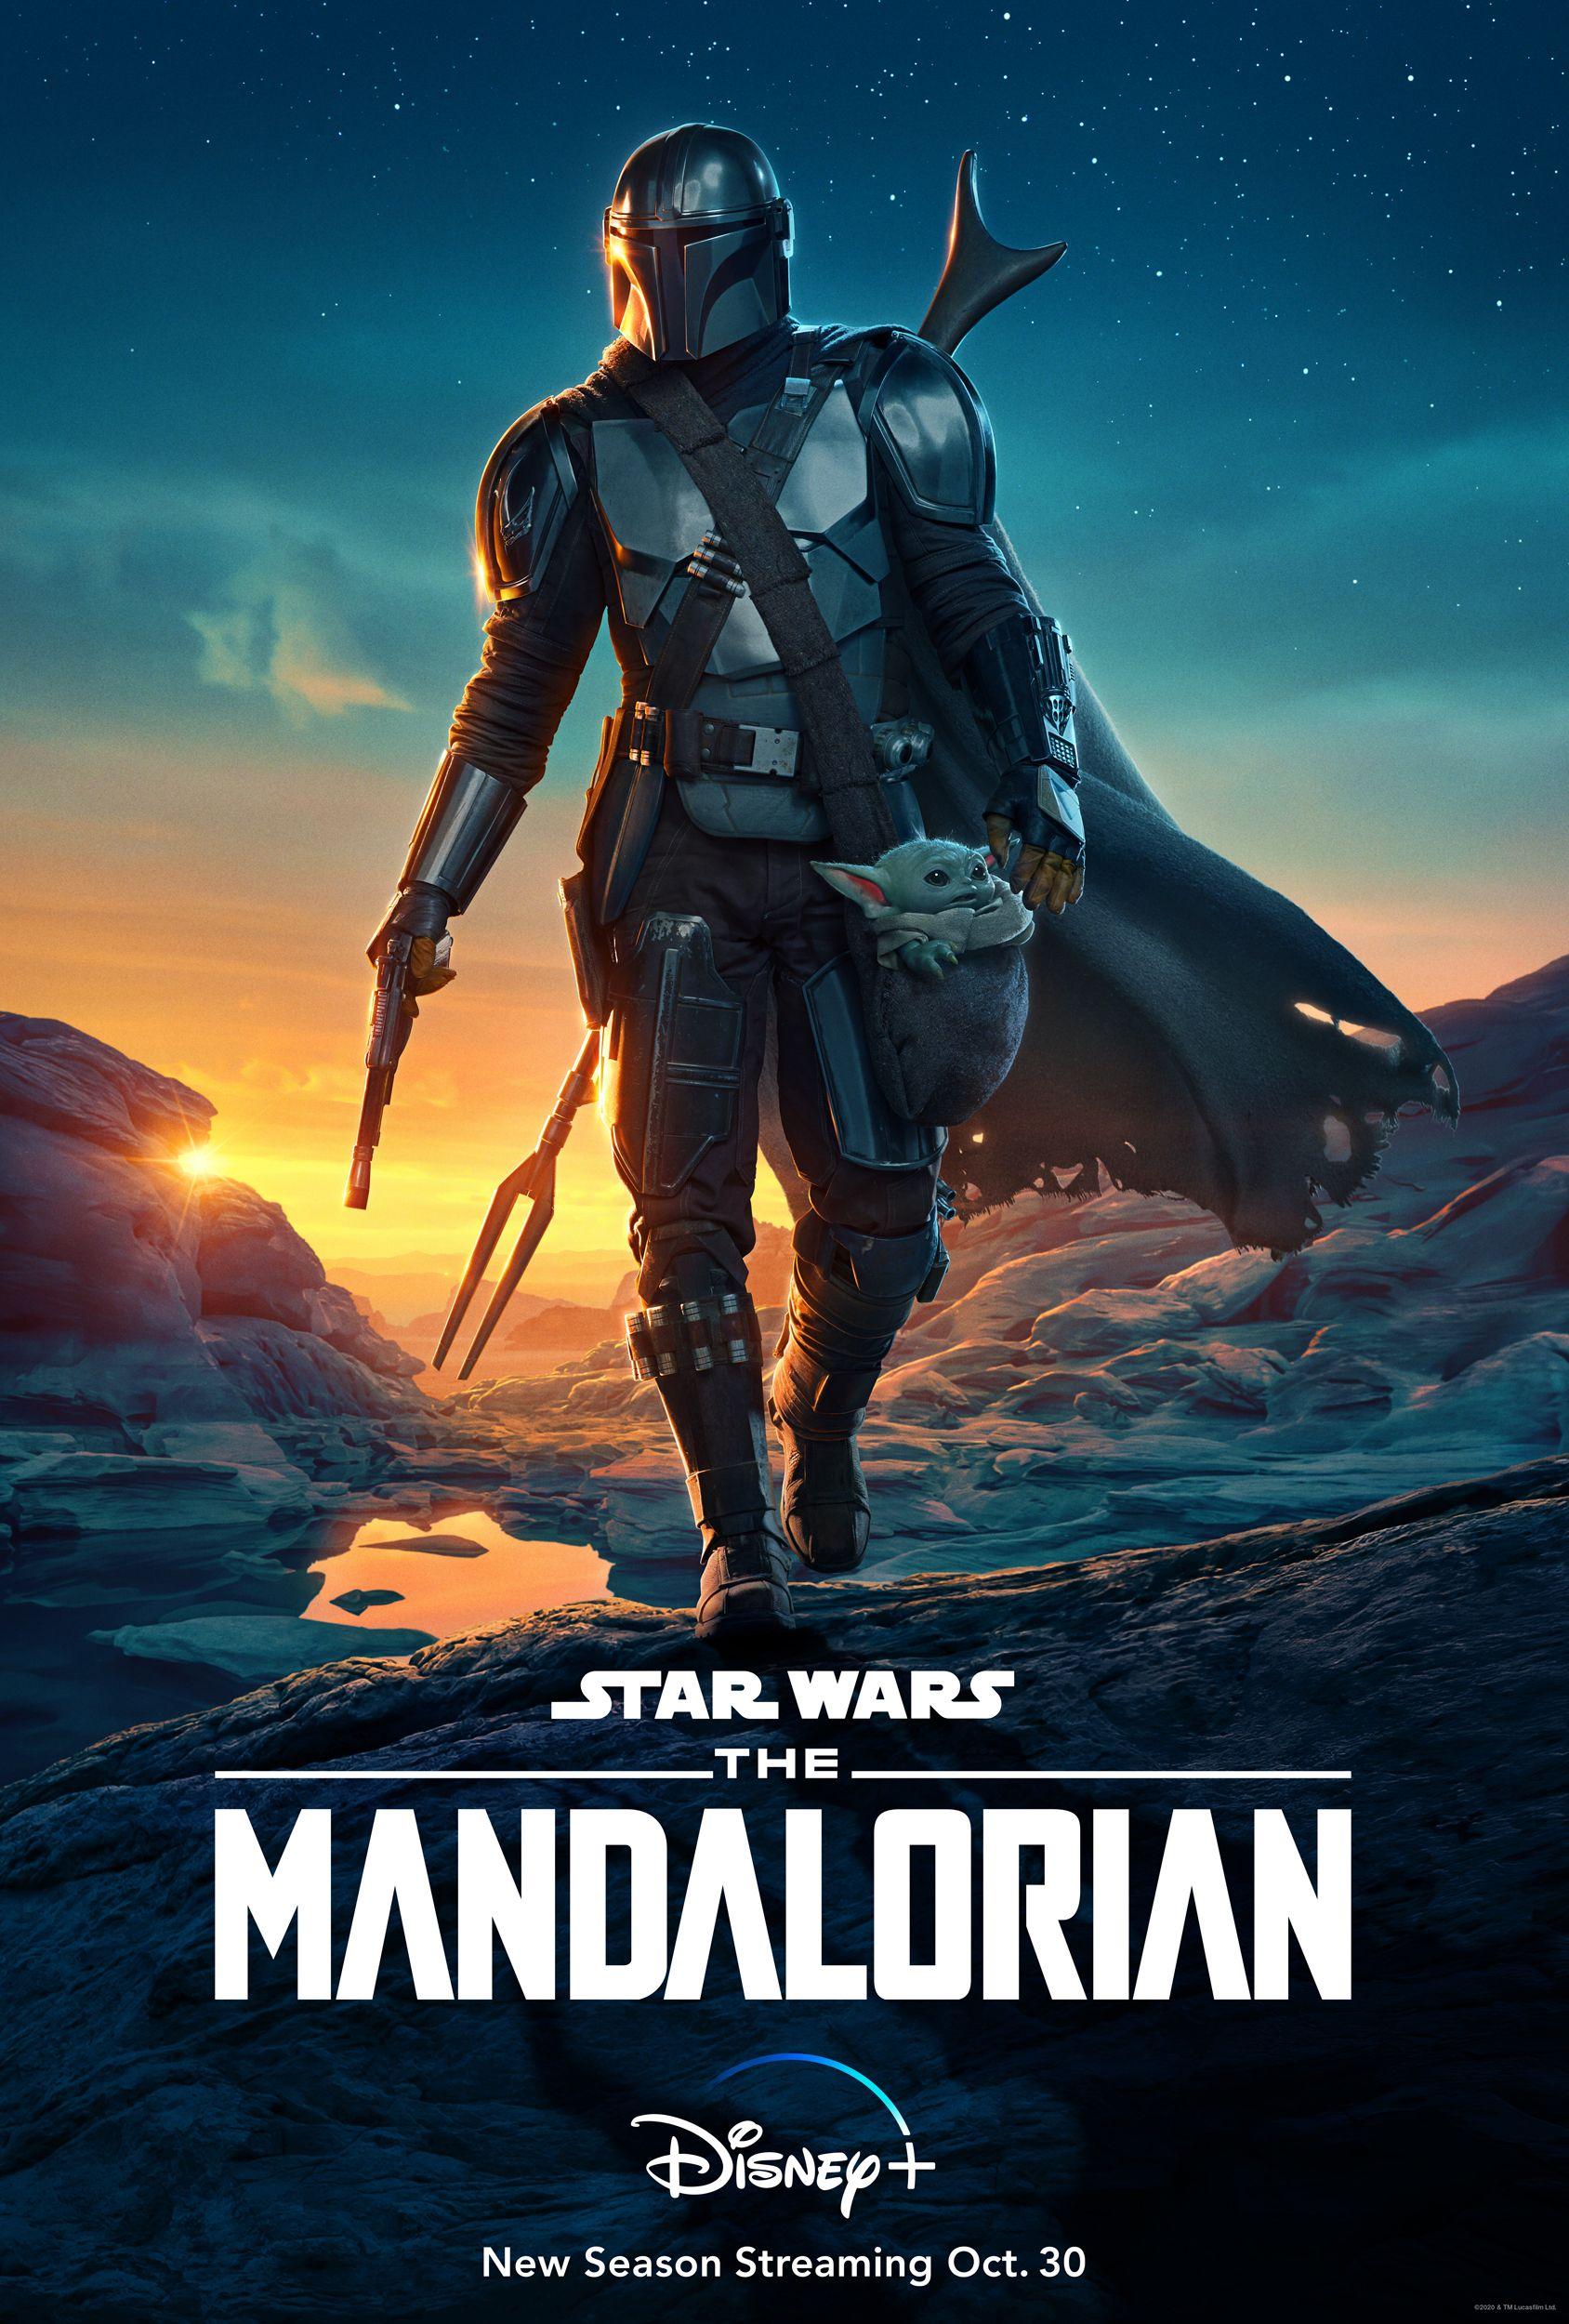 The_Mandalorian_Season_Two_Key_Art